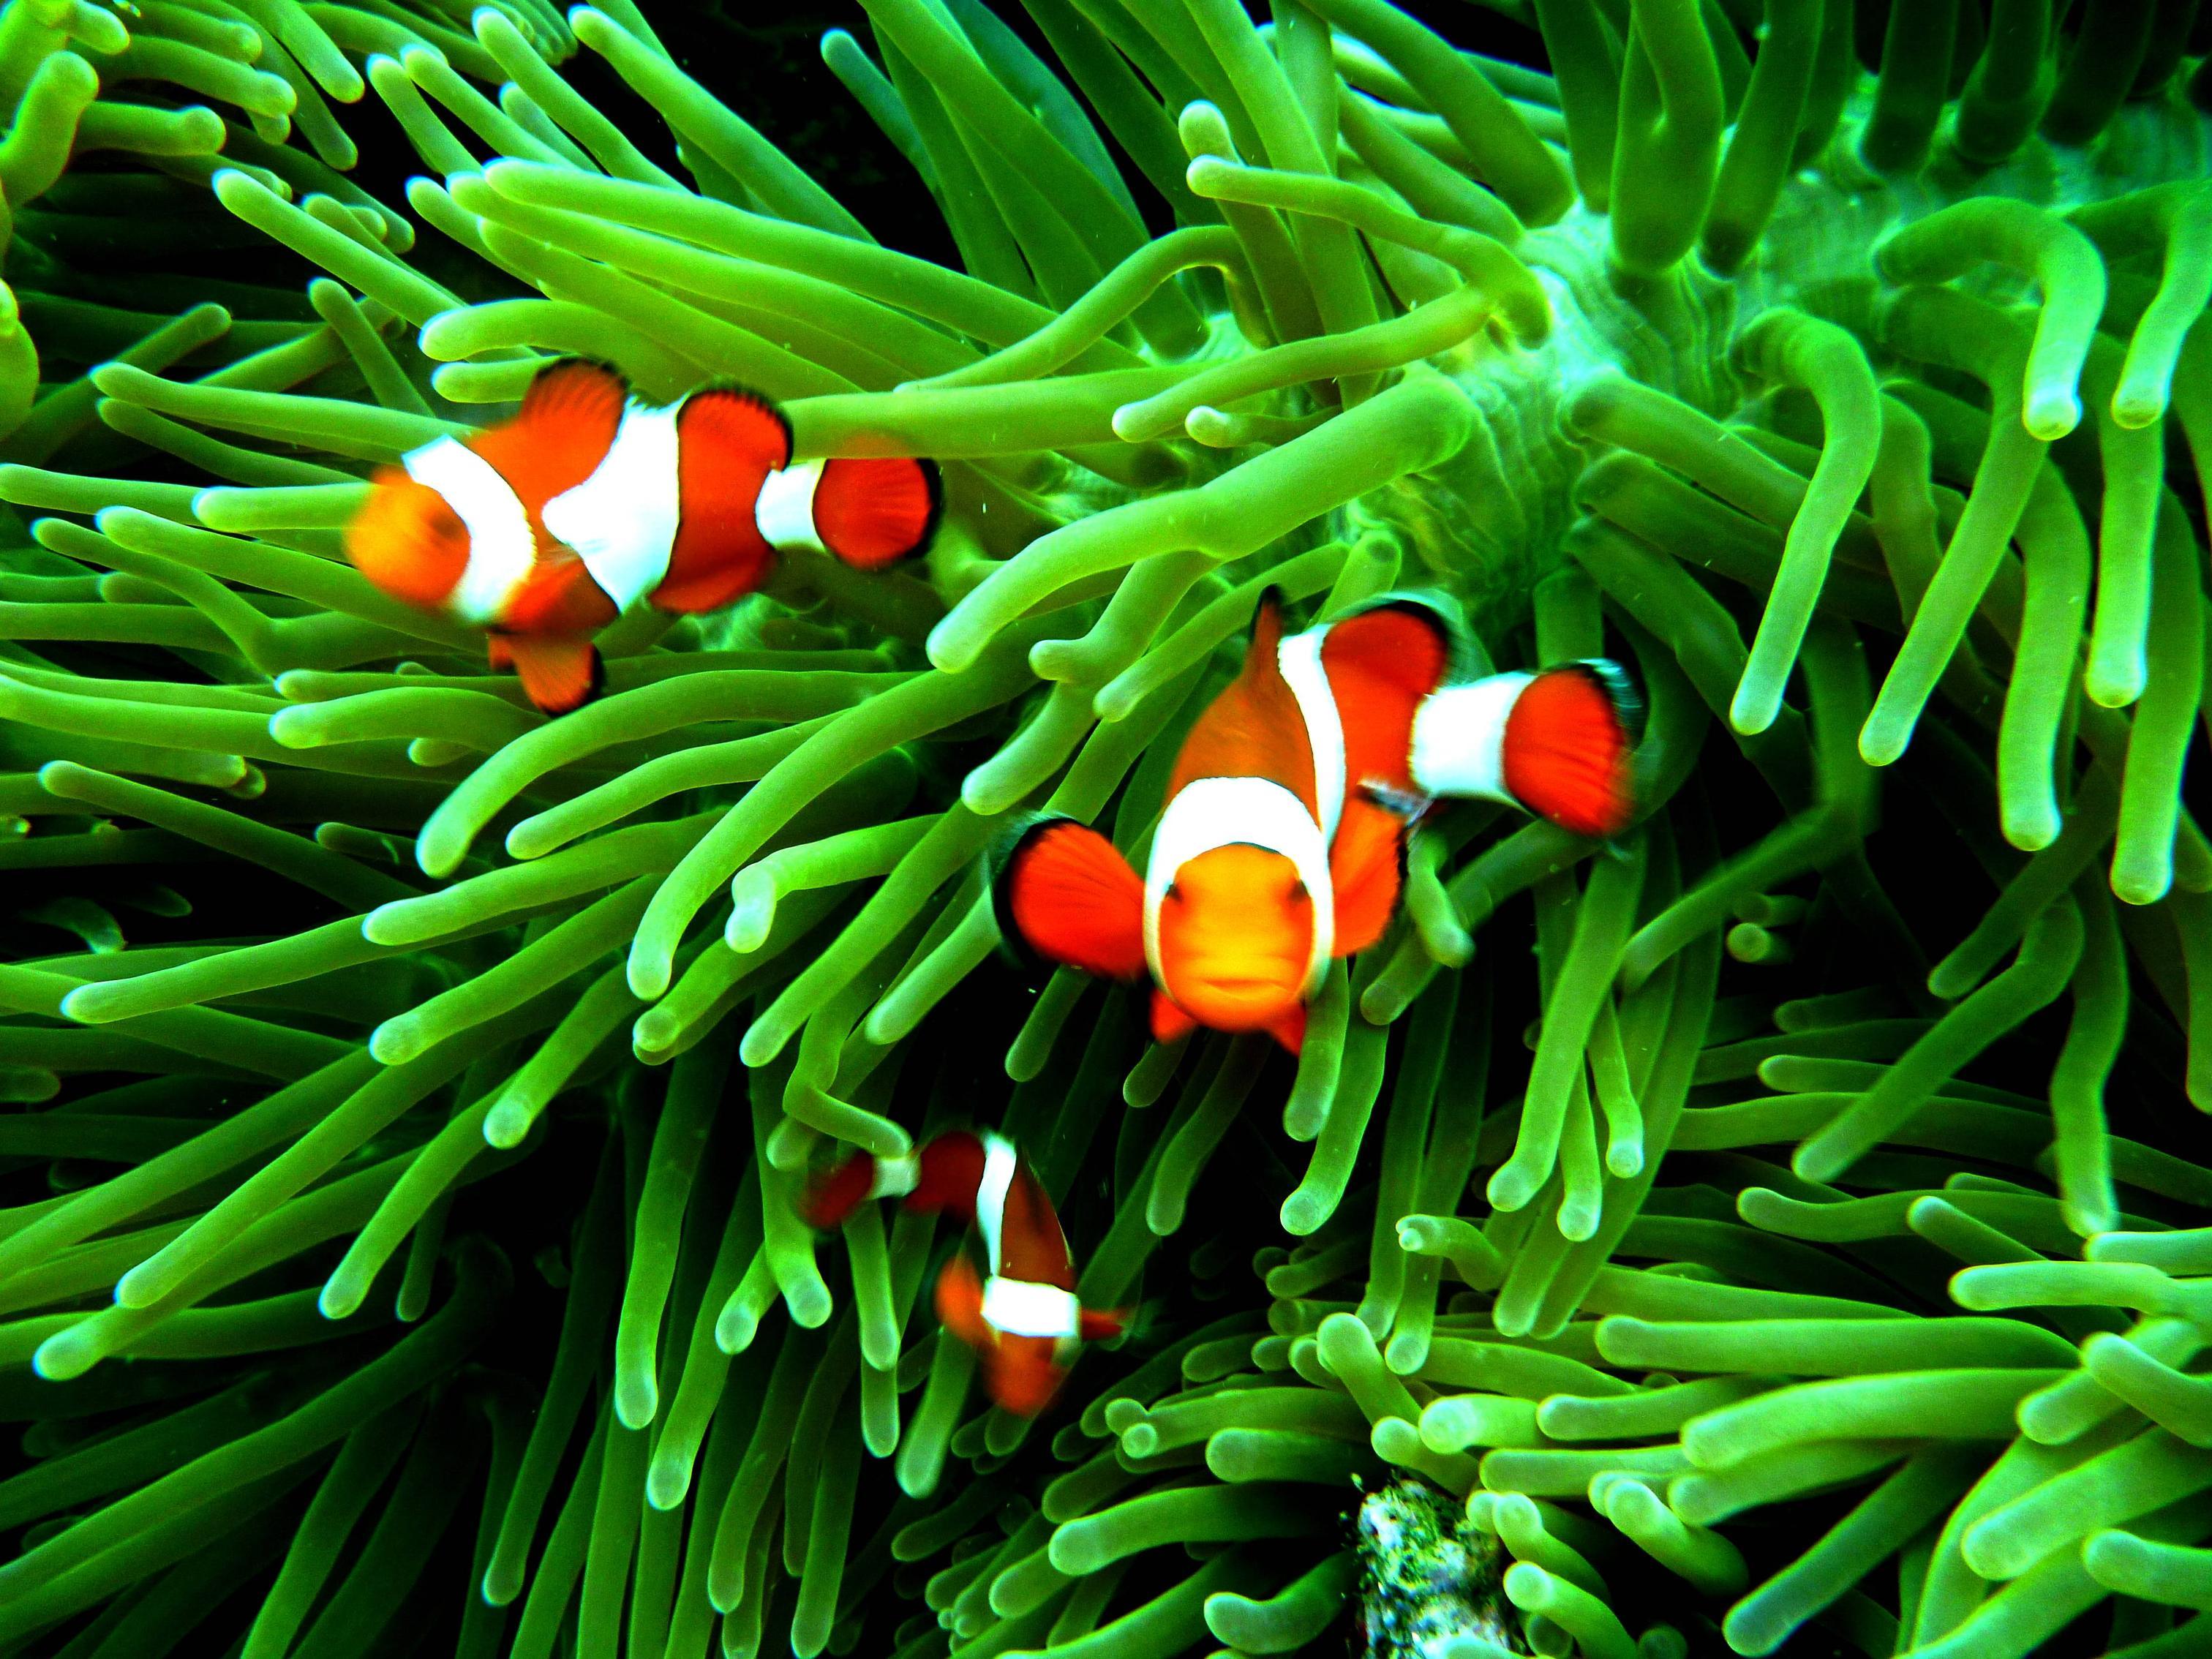 Clown Fish Wallpaper Iphone 6 Plus Iphone Clown Fish Wallpapers Group 58